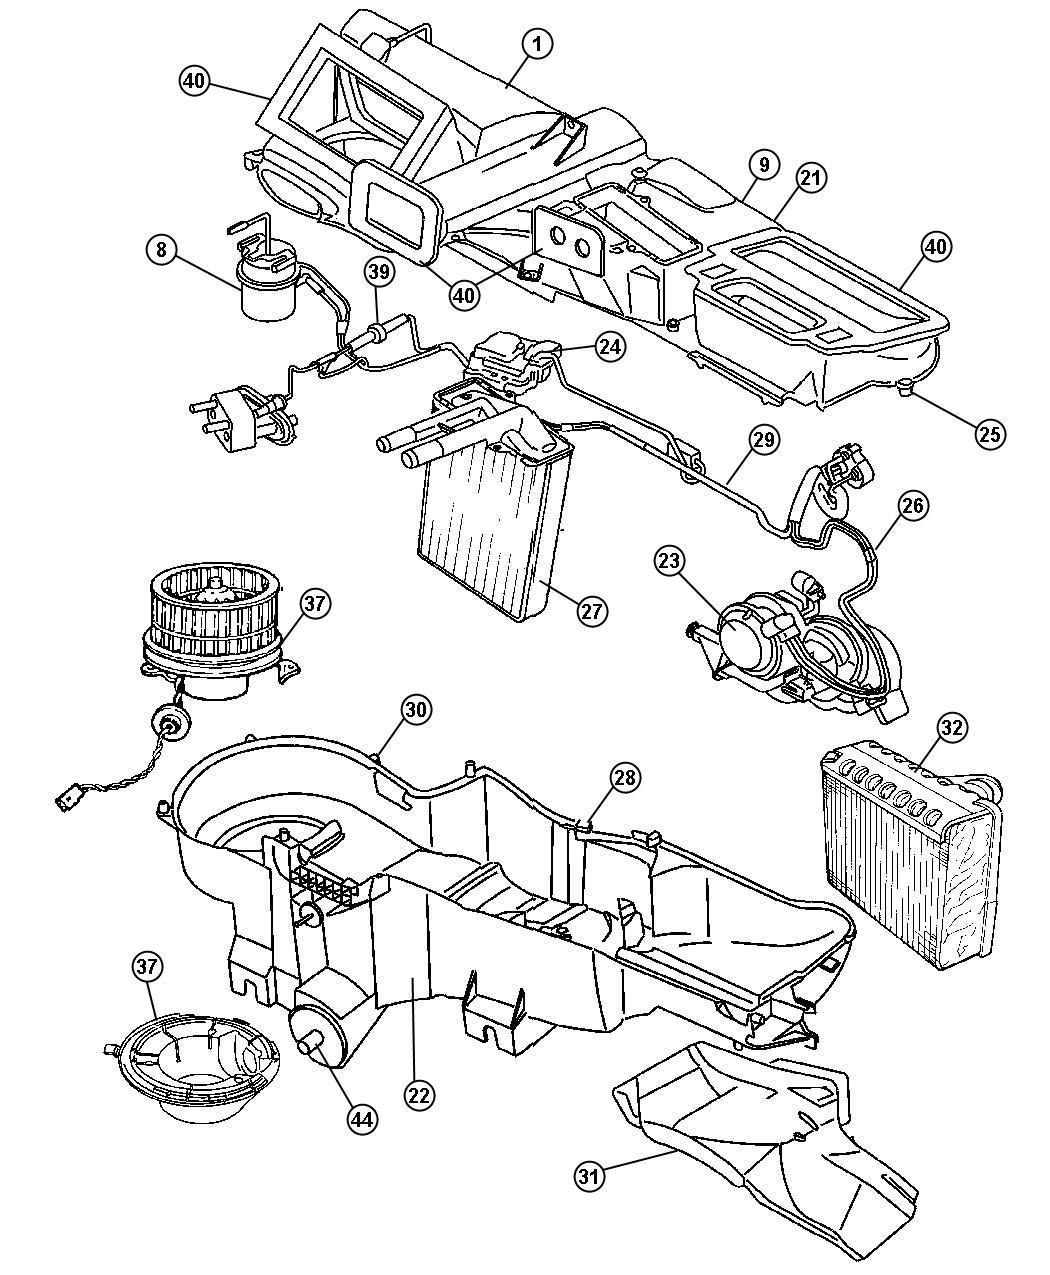 Jeep Liberty Evaporator Kit Air Conditioning